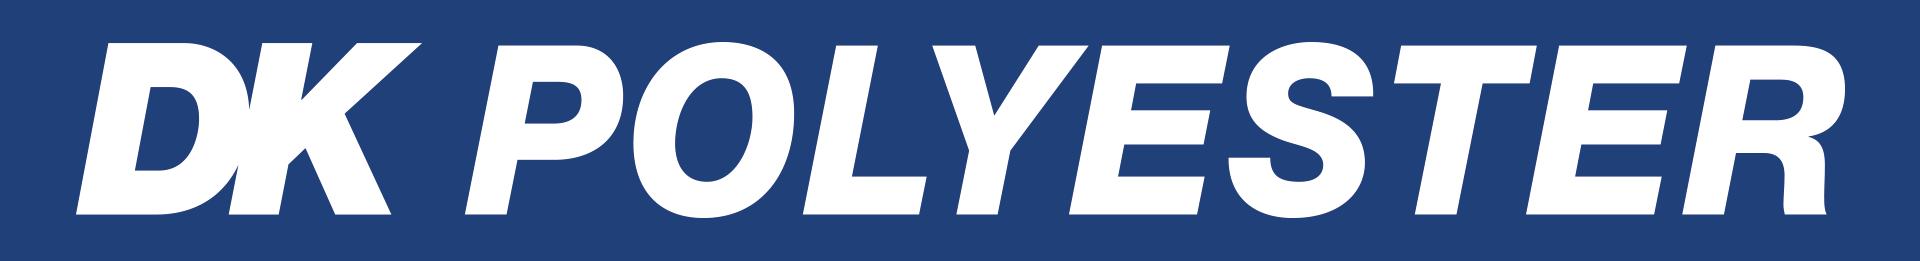 DK Polyester banner